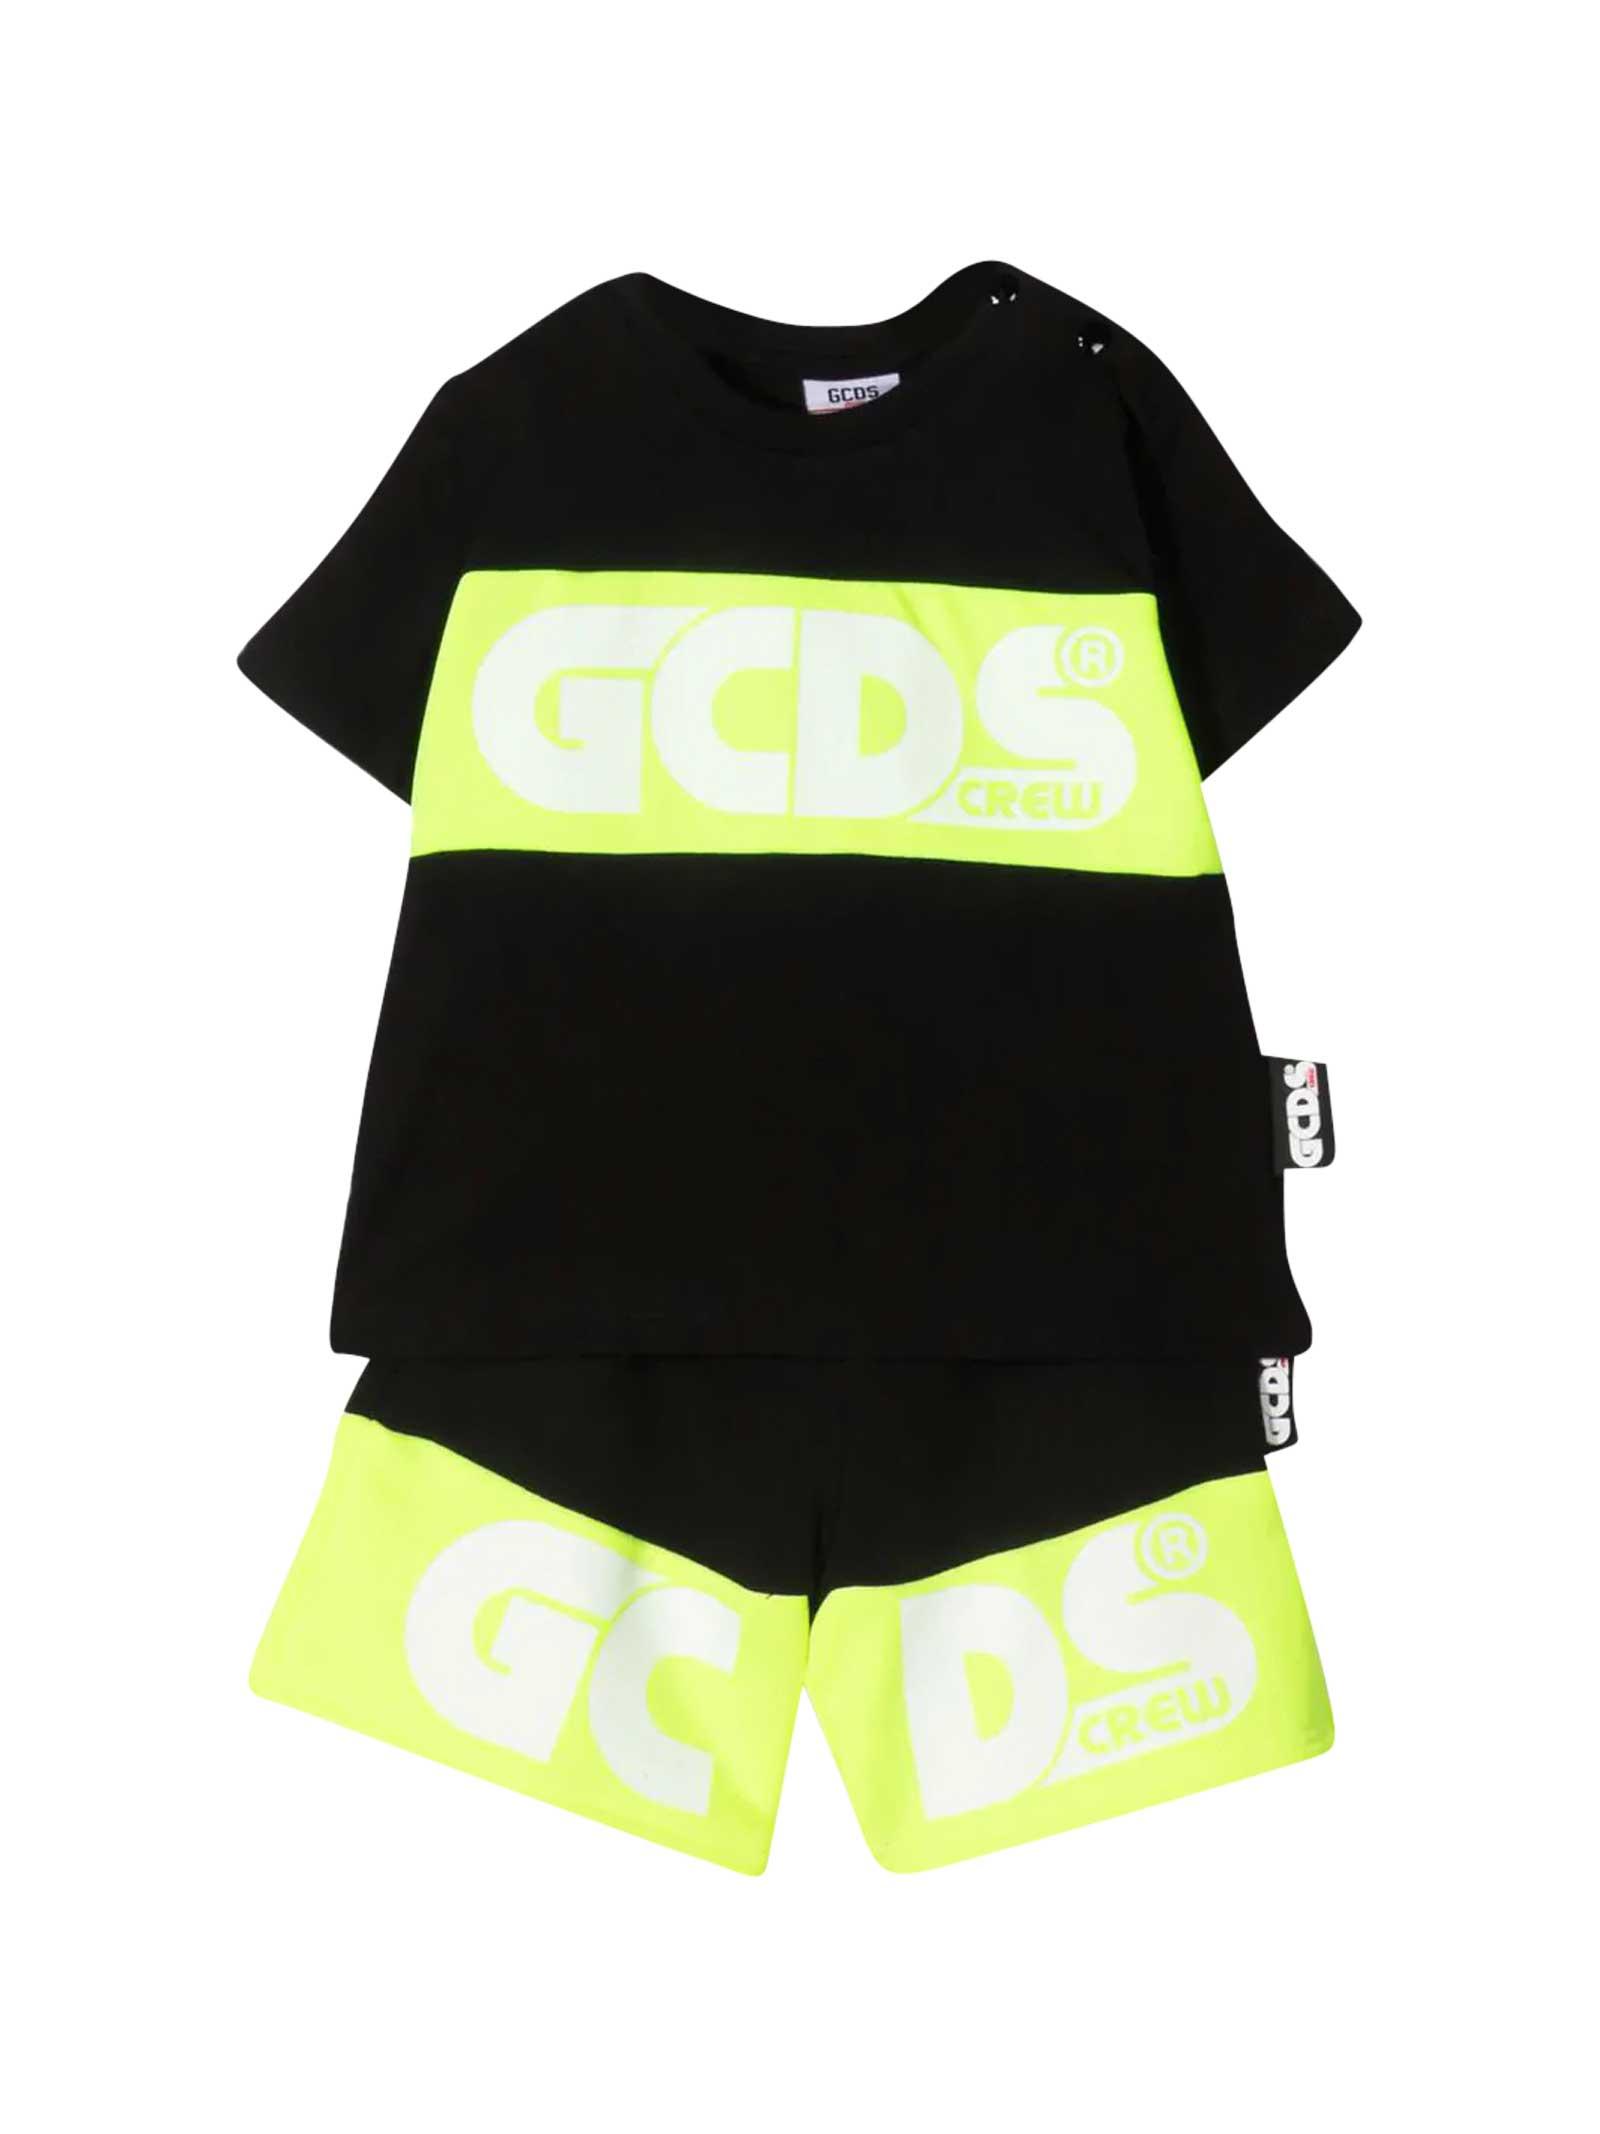 Gcds Mini Sets NEWBORN OUTFIT